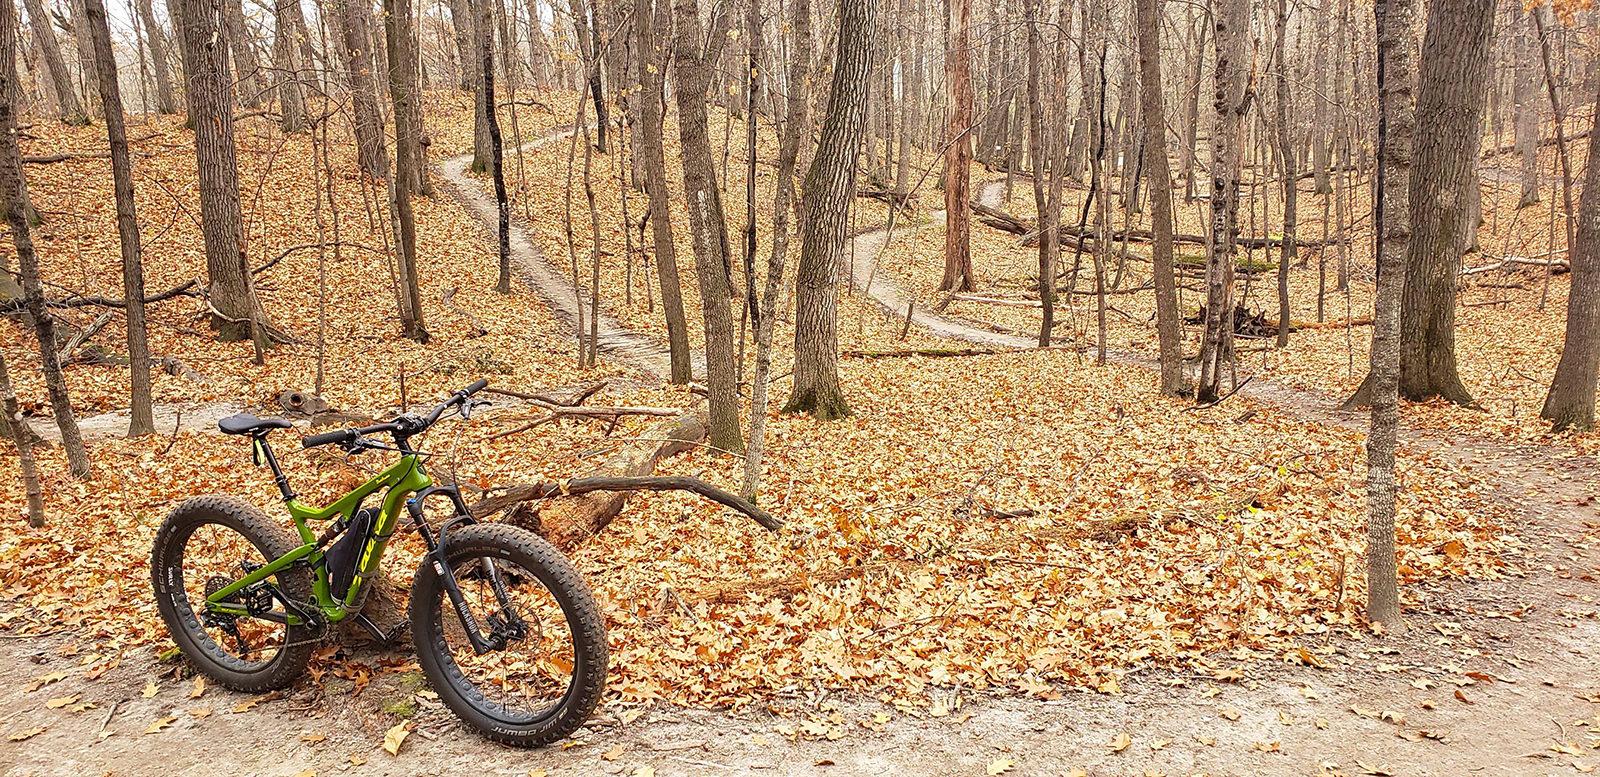 mountain-bike-fall-woods_1600.jpg